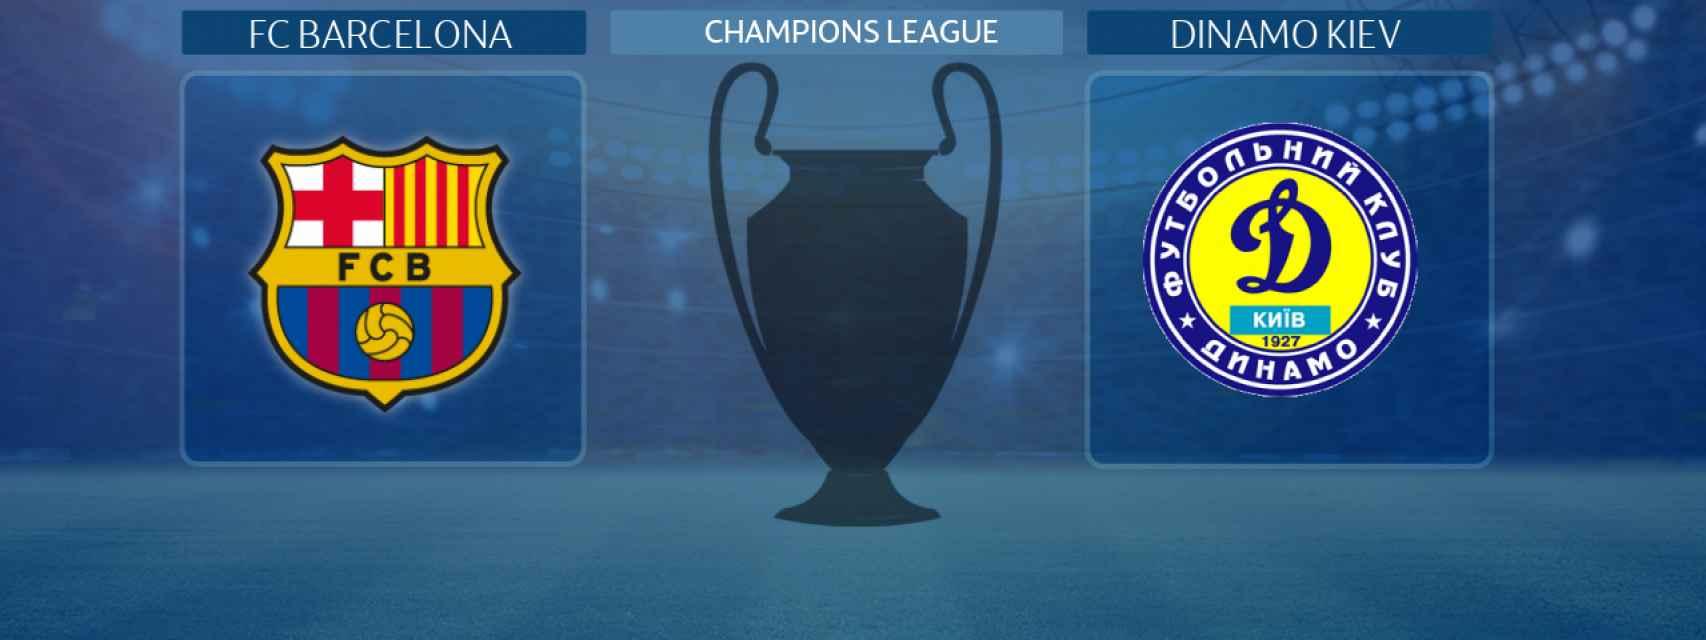 FC Barcelona - Dinamo Kiev, partido de la Champions League